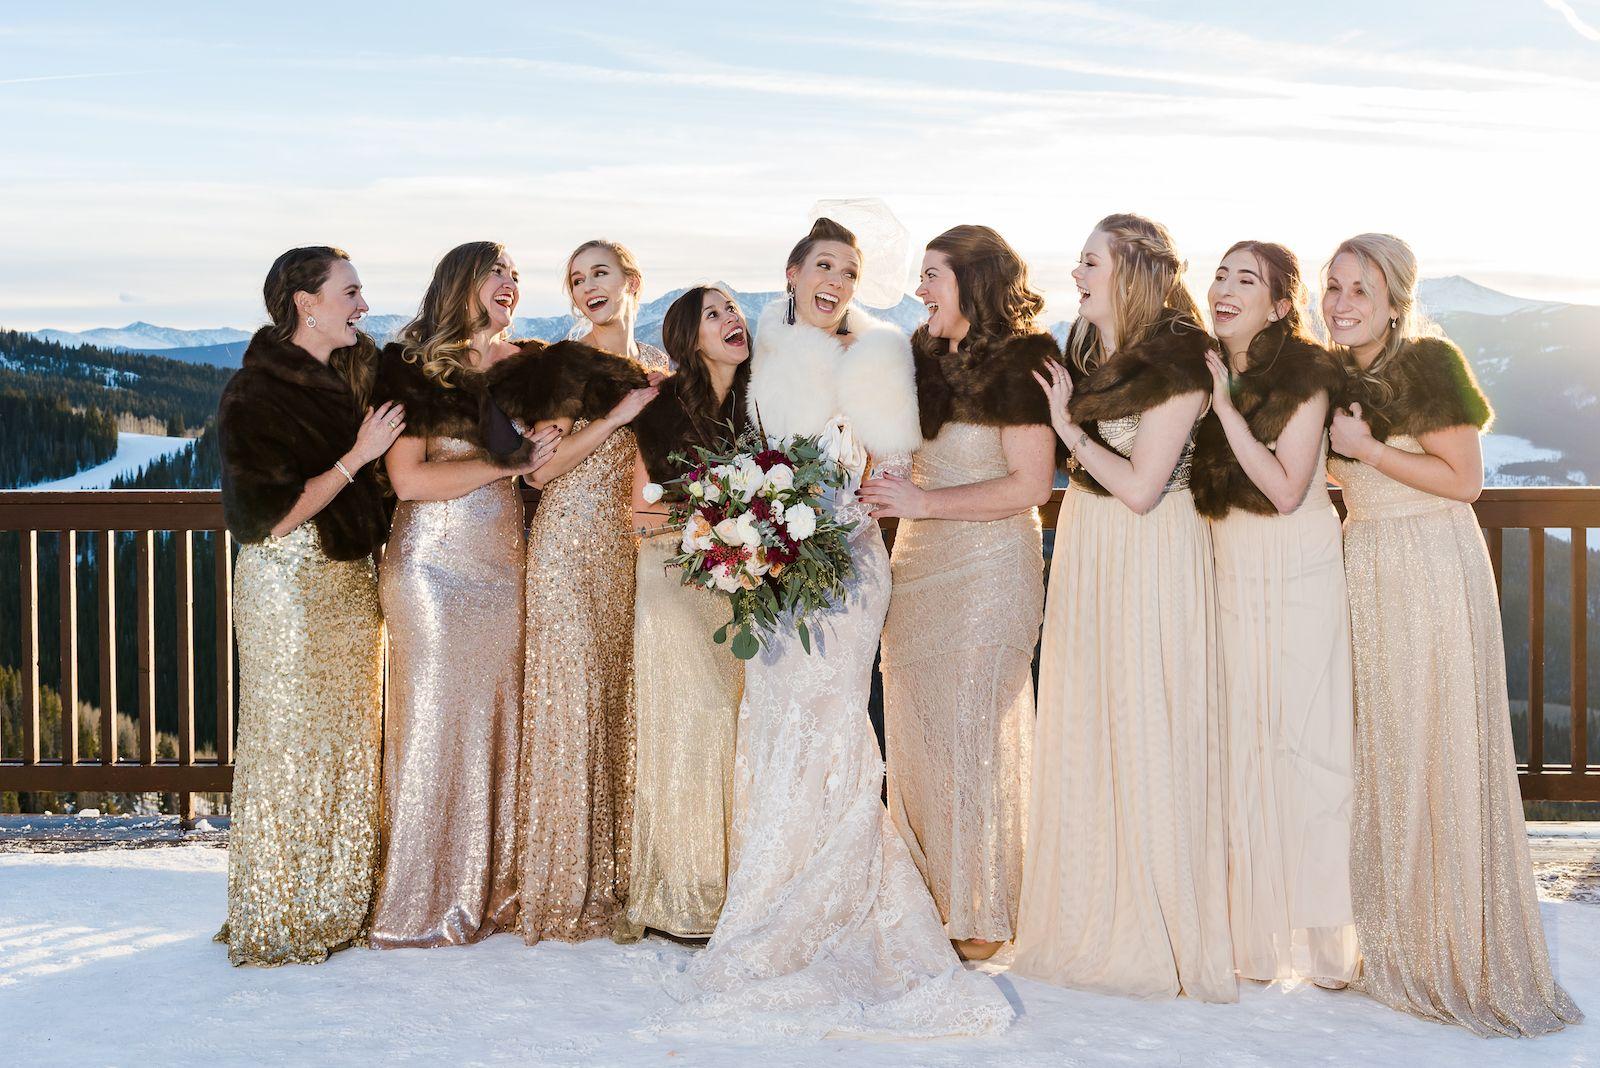 A Bride And Her Bridesmaids Shine At A Winter Wedding Bridesmaid Blog Photo Bridesmaid Dresses